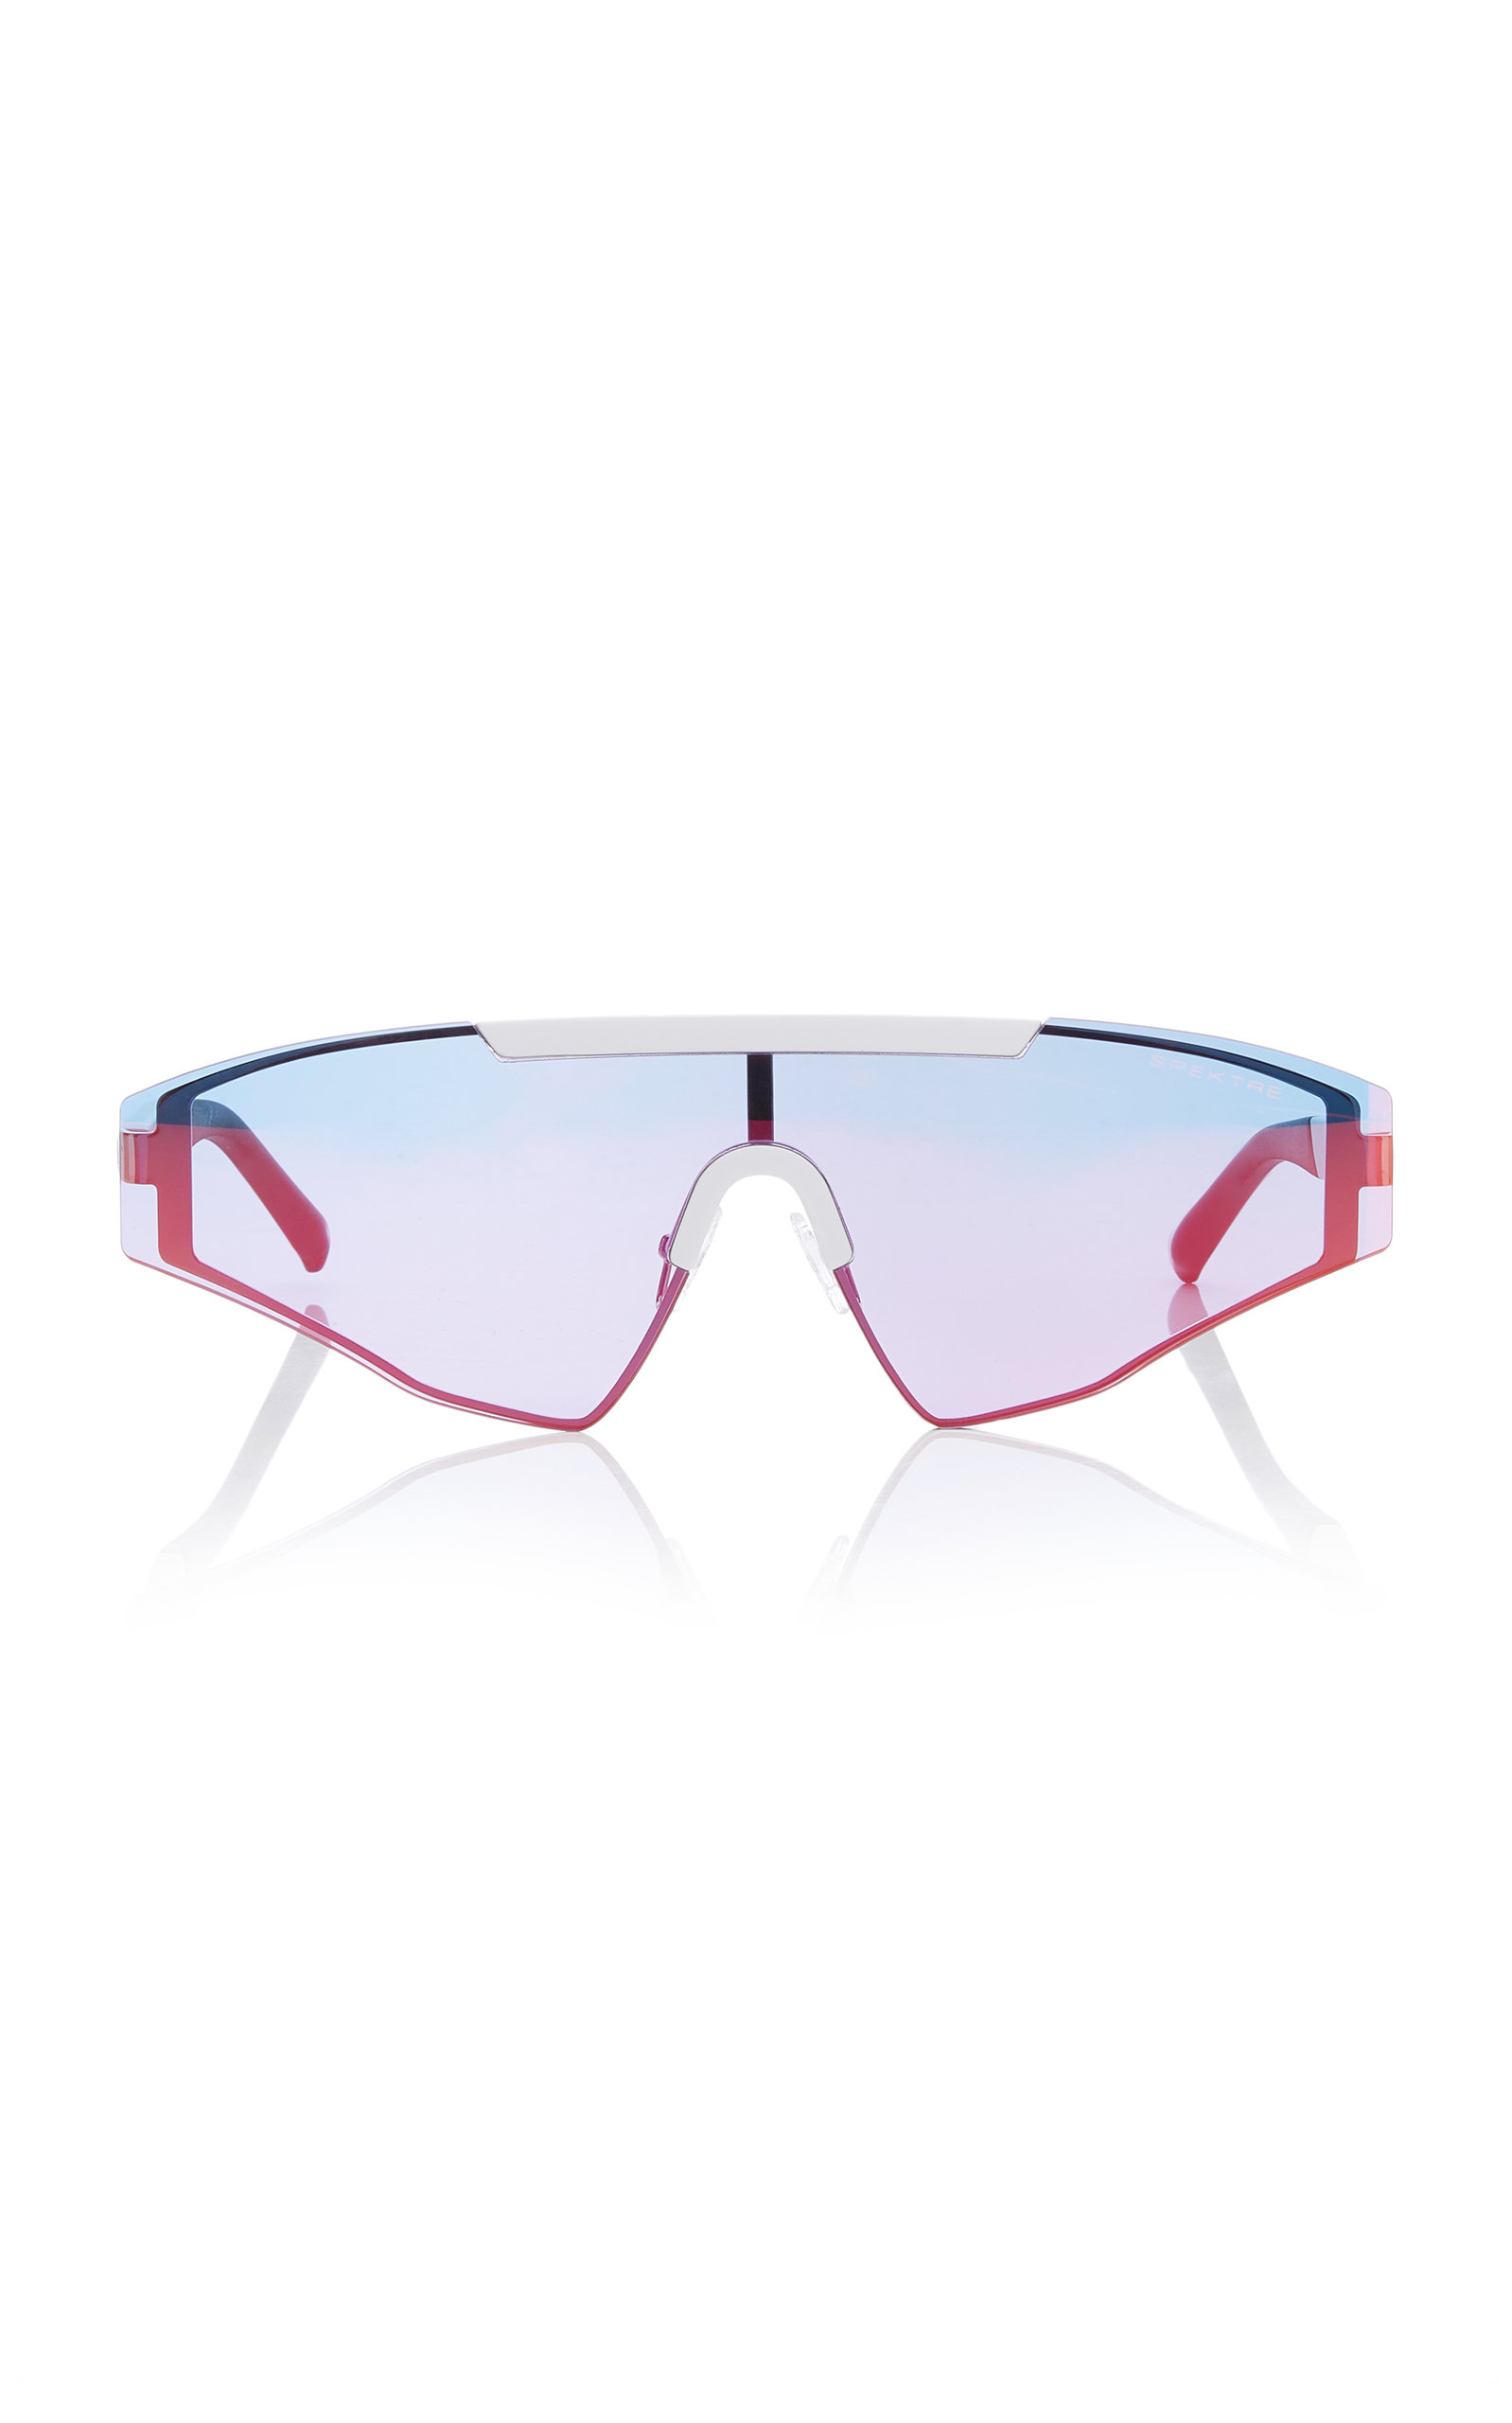 SPEKTRE Vincent Aviator-Style Gunmetal-Tone Sunglasses in Blue